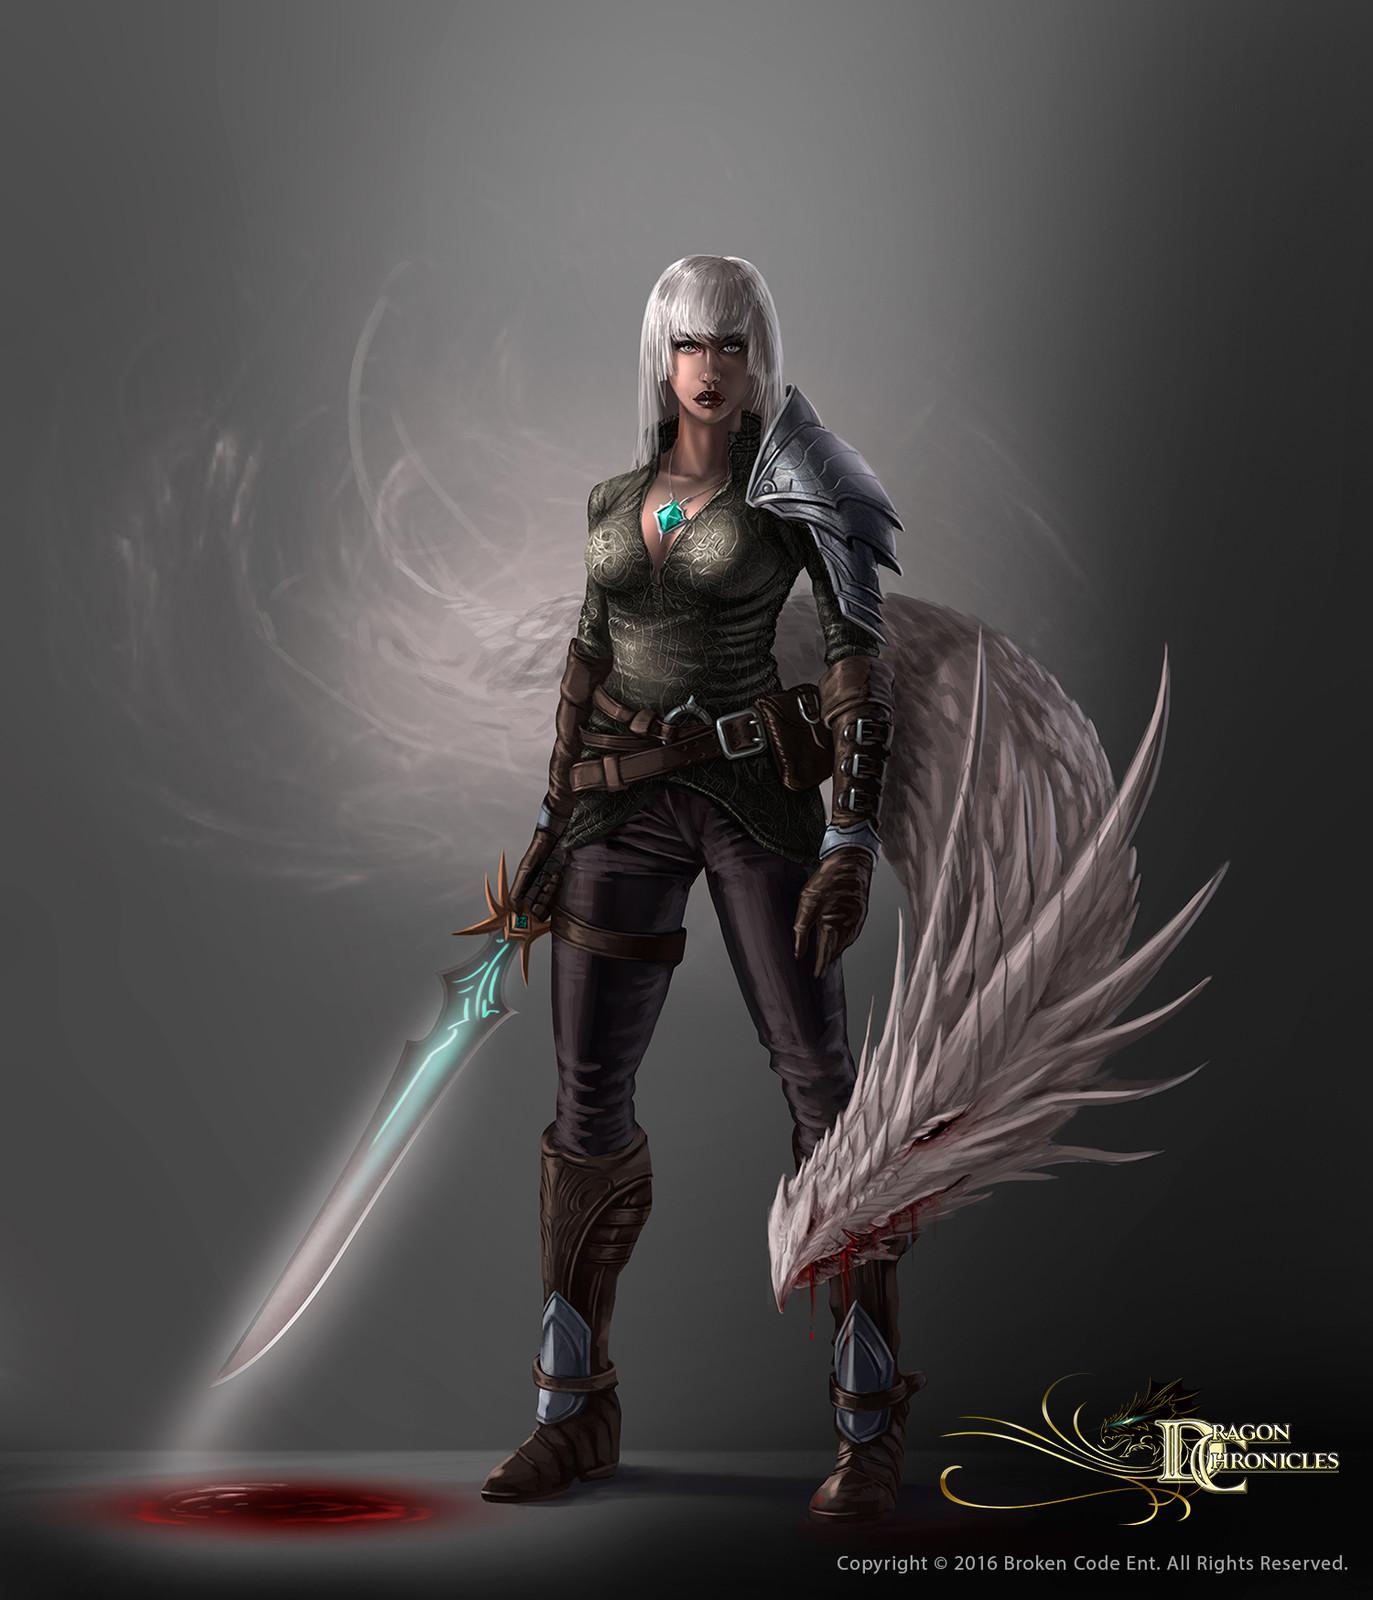 White Dragon Summoner - Dragon Chronicles